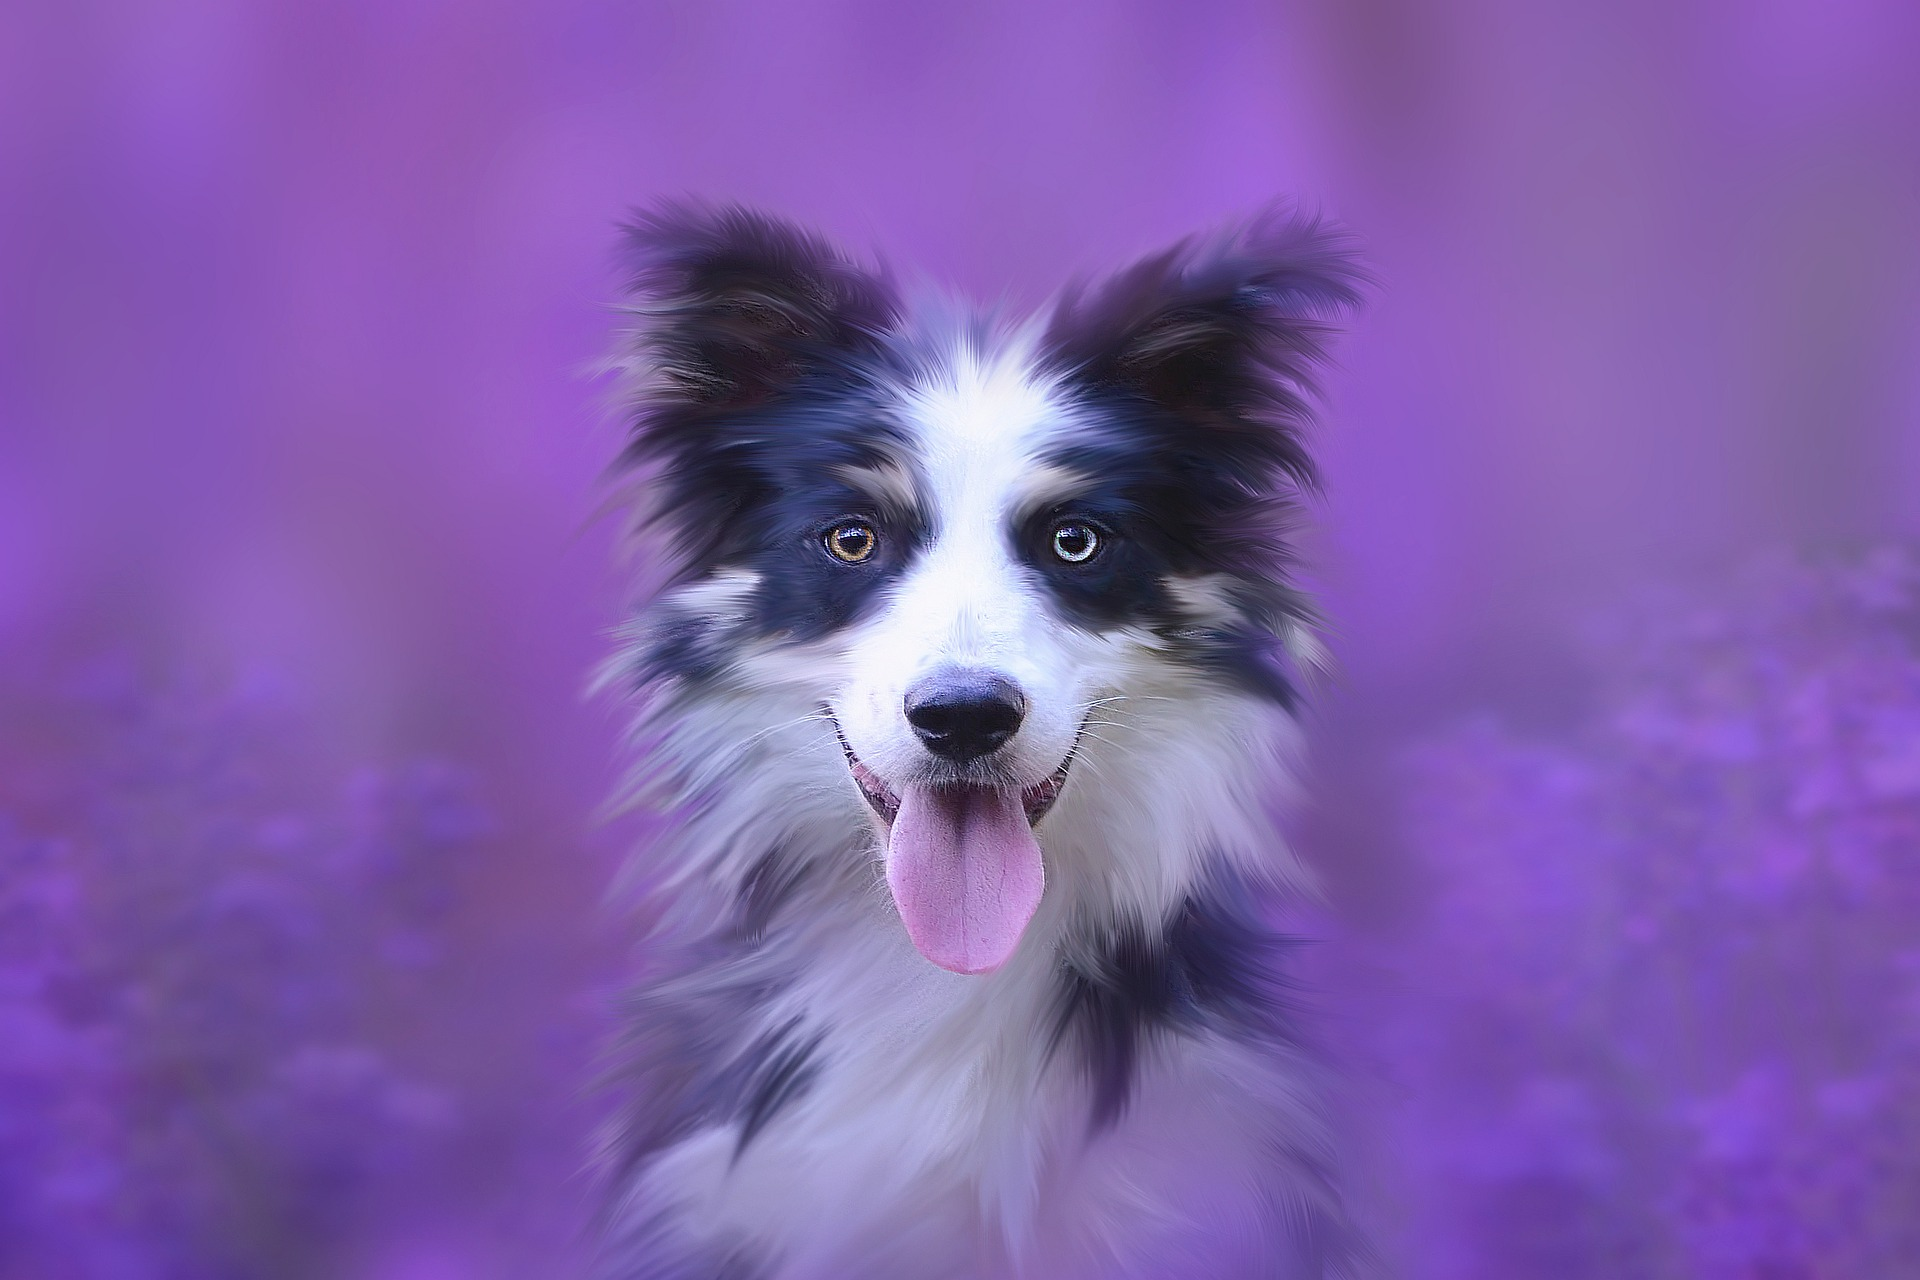 Colliesta mieleen Lassie-elokuvat